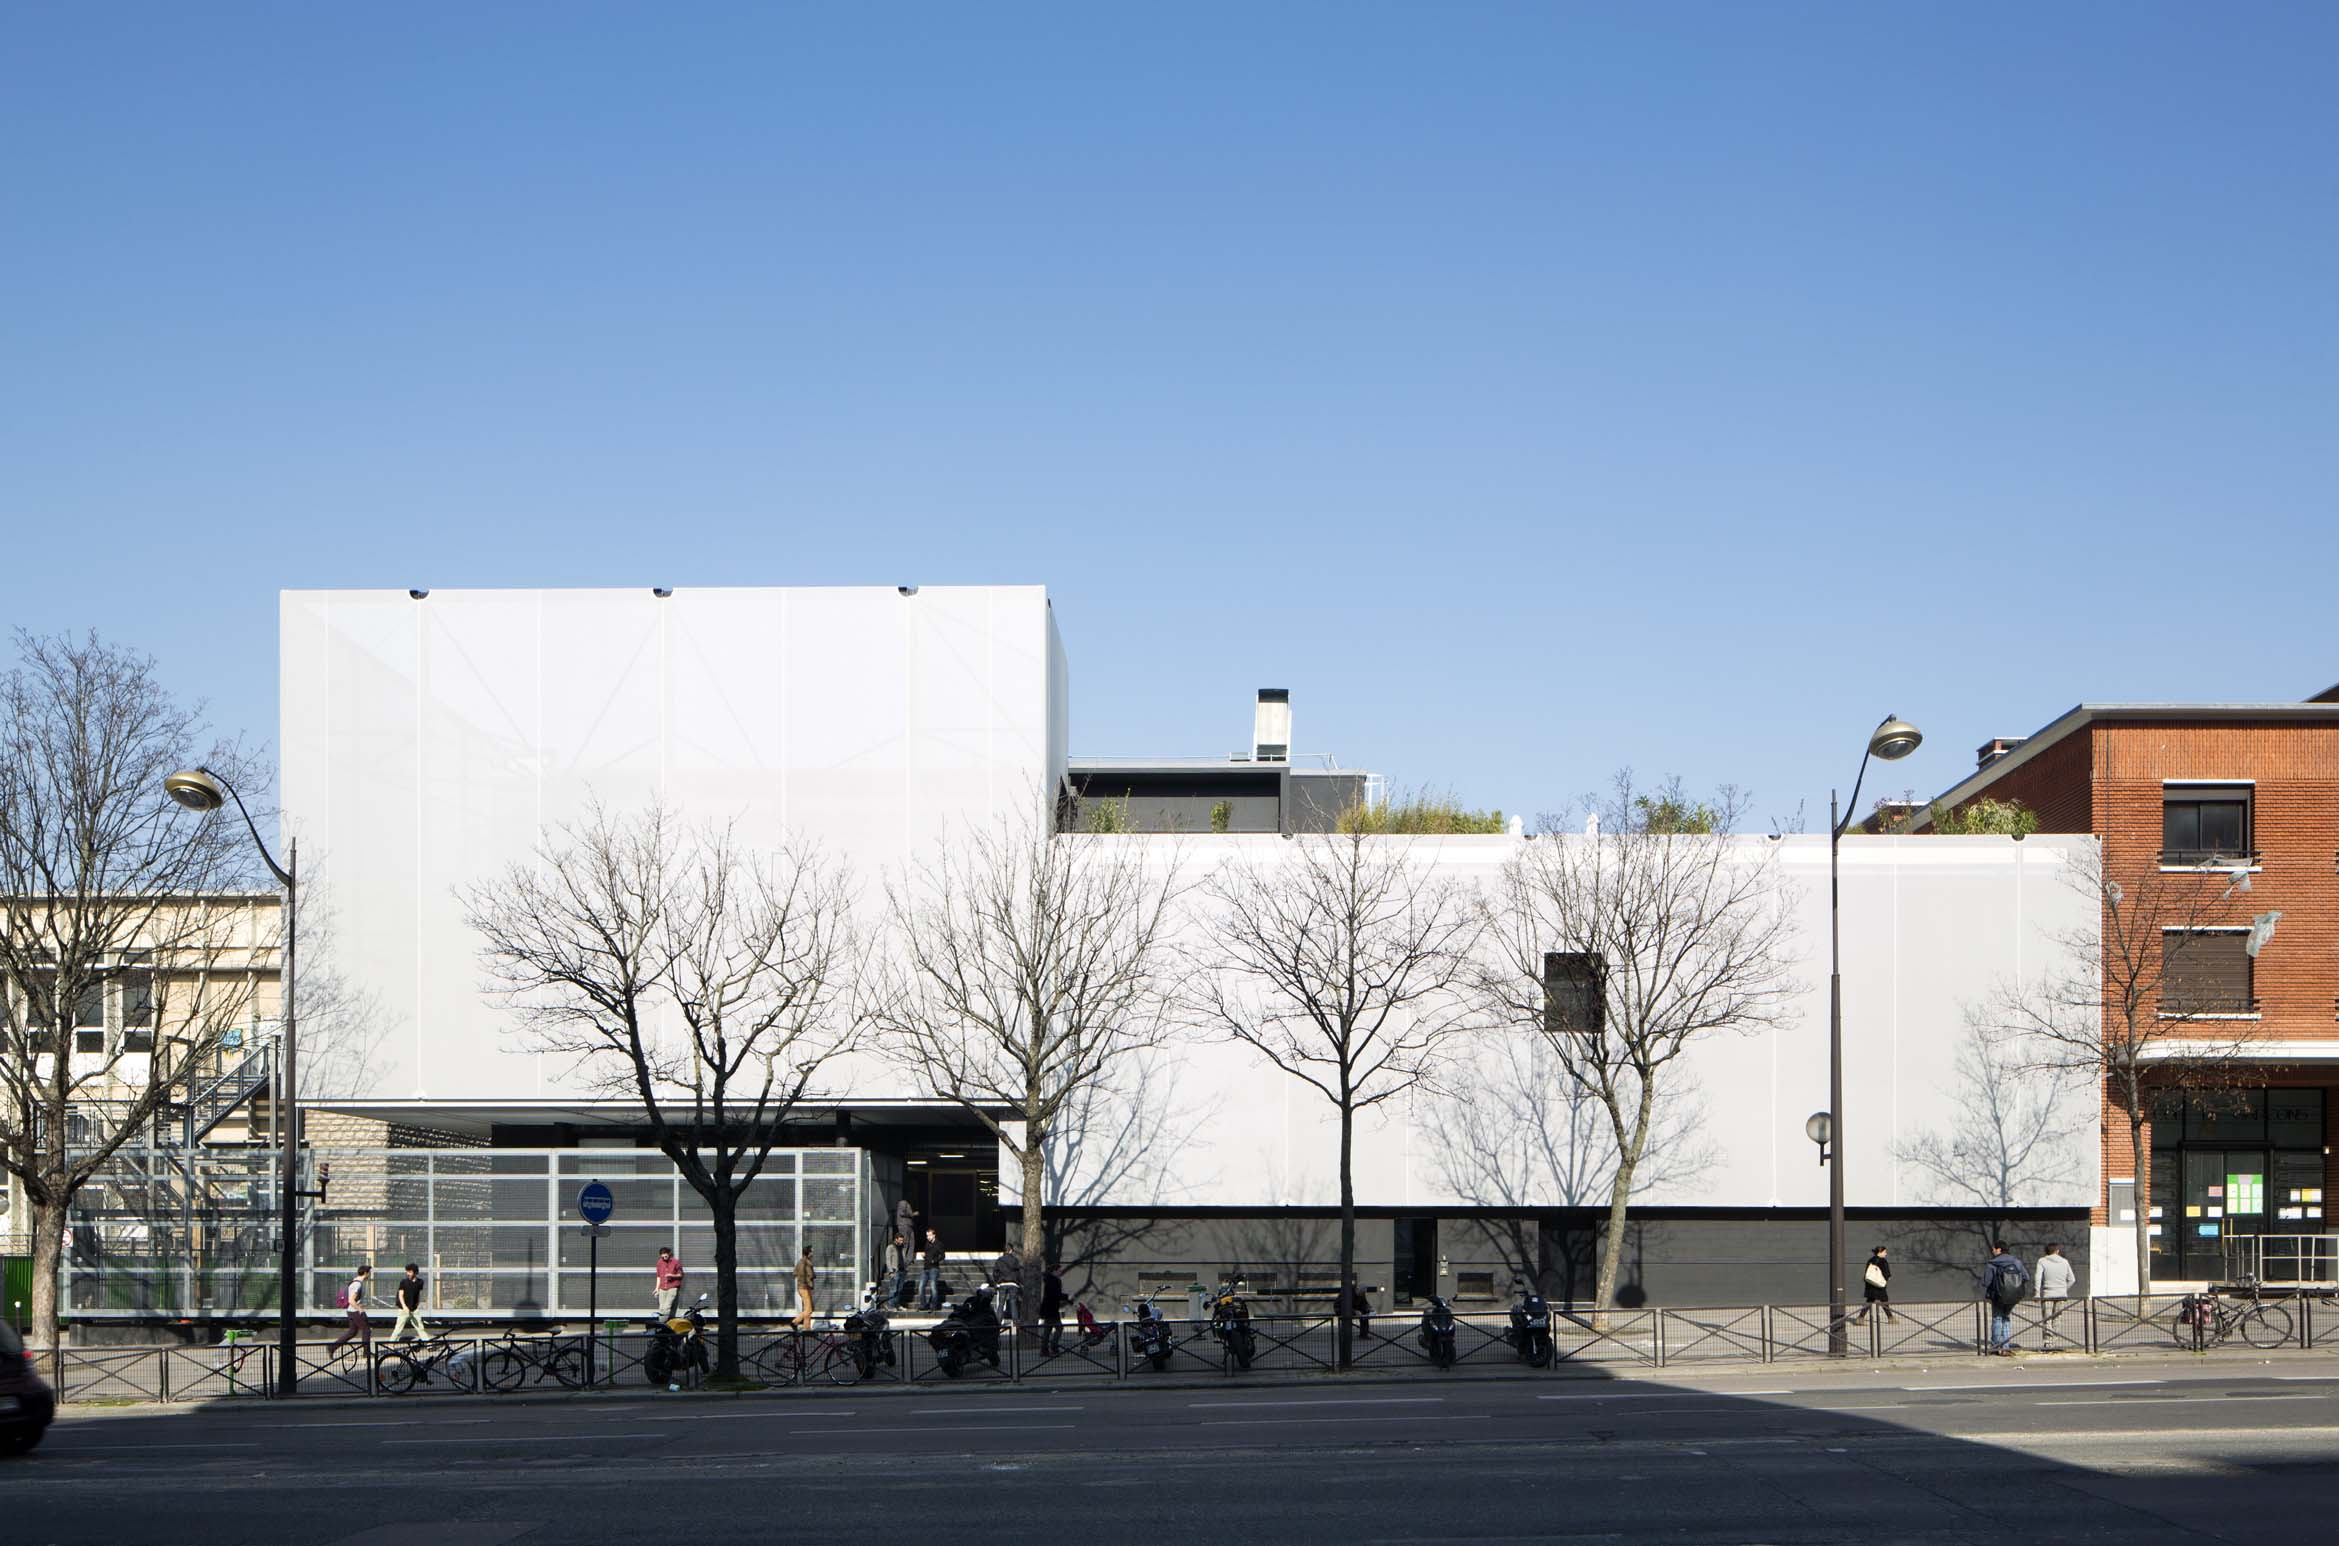 Ecole 42 - NOC 42 - AR Studio Architectures - Xavier NIEL - Kwame YAMGNANE - Florian BUCHER - Nicolas SADIRAC - Free - Reinventer Paris (6).jpg